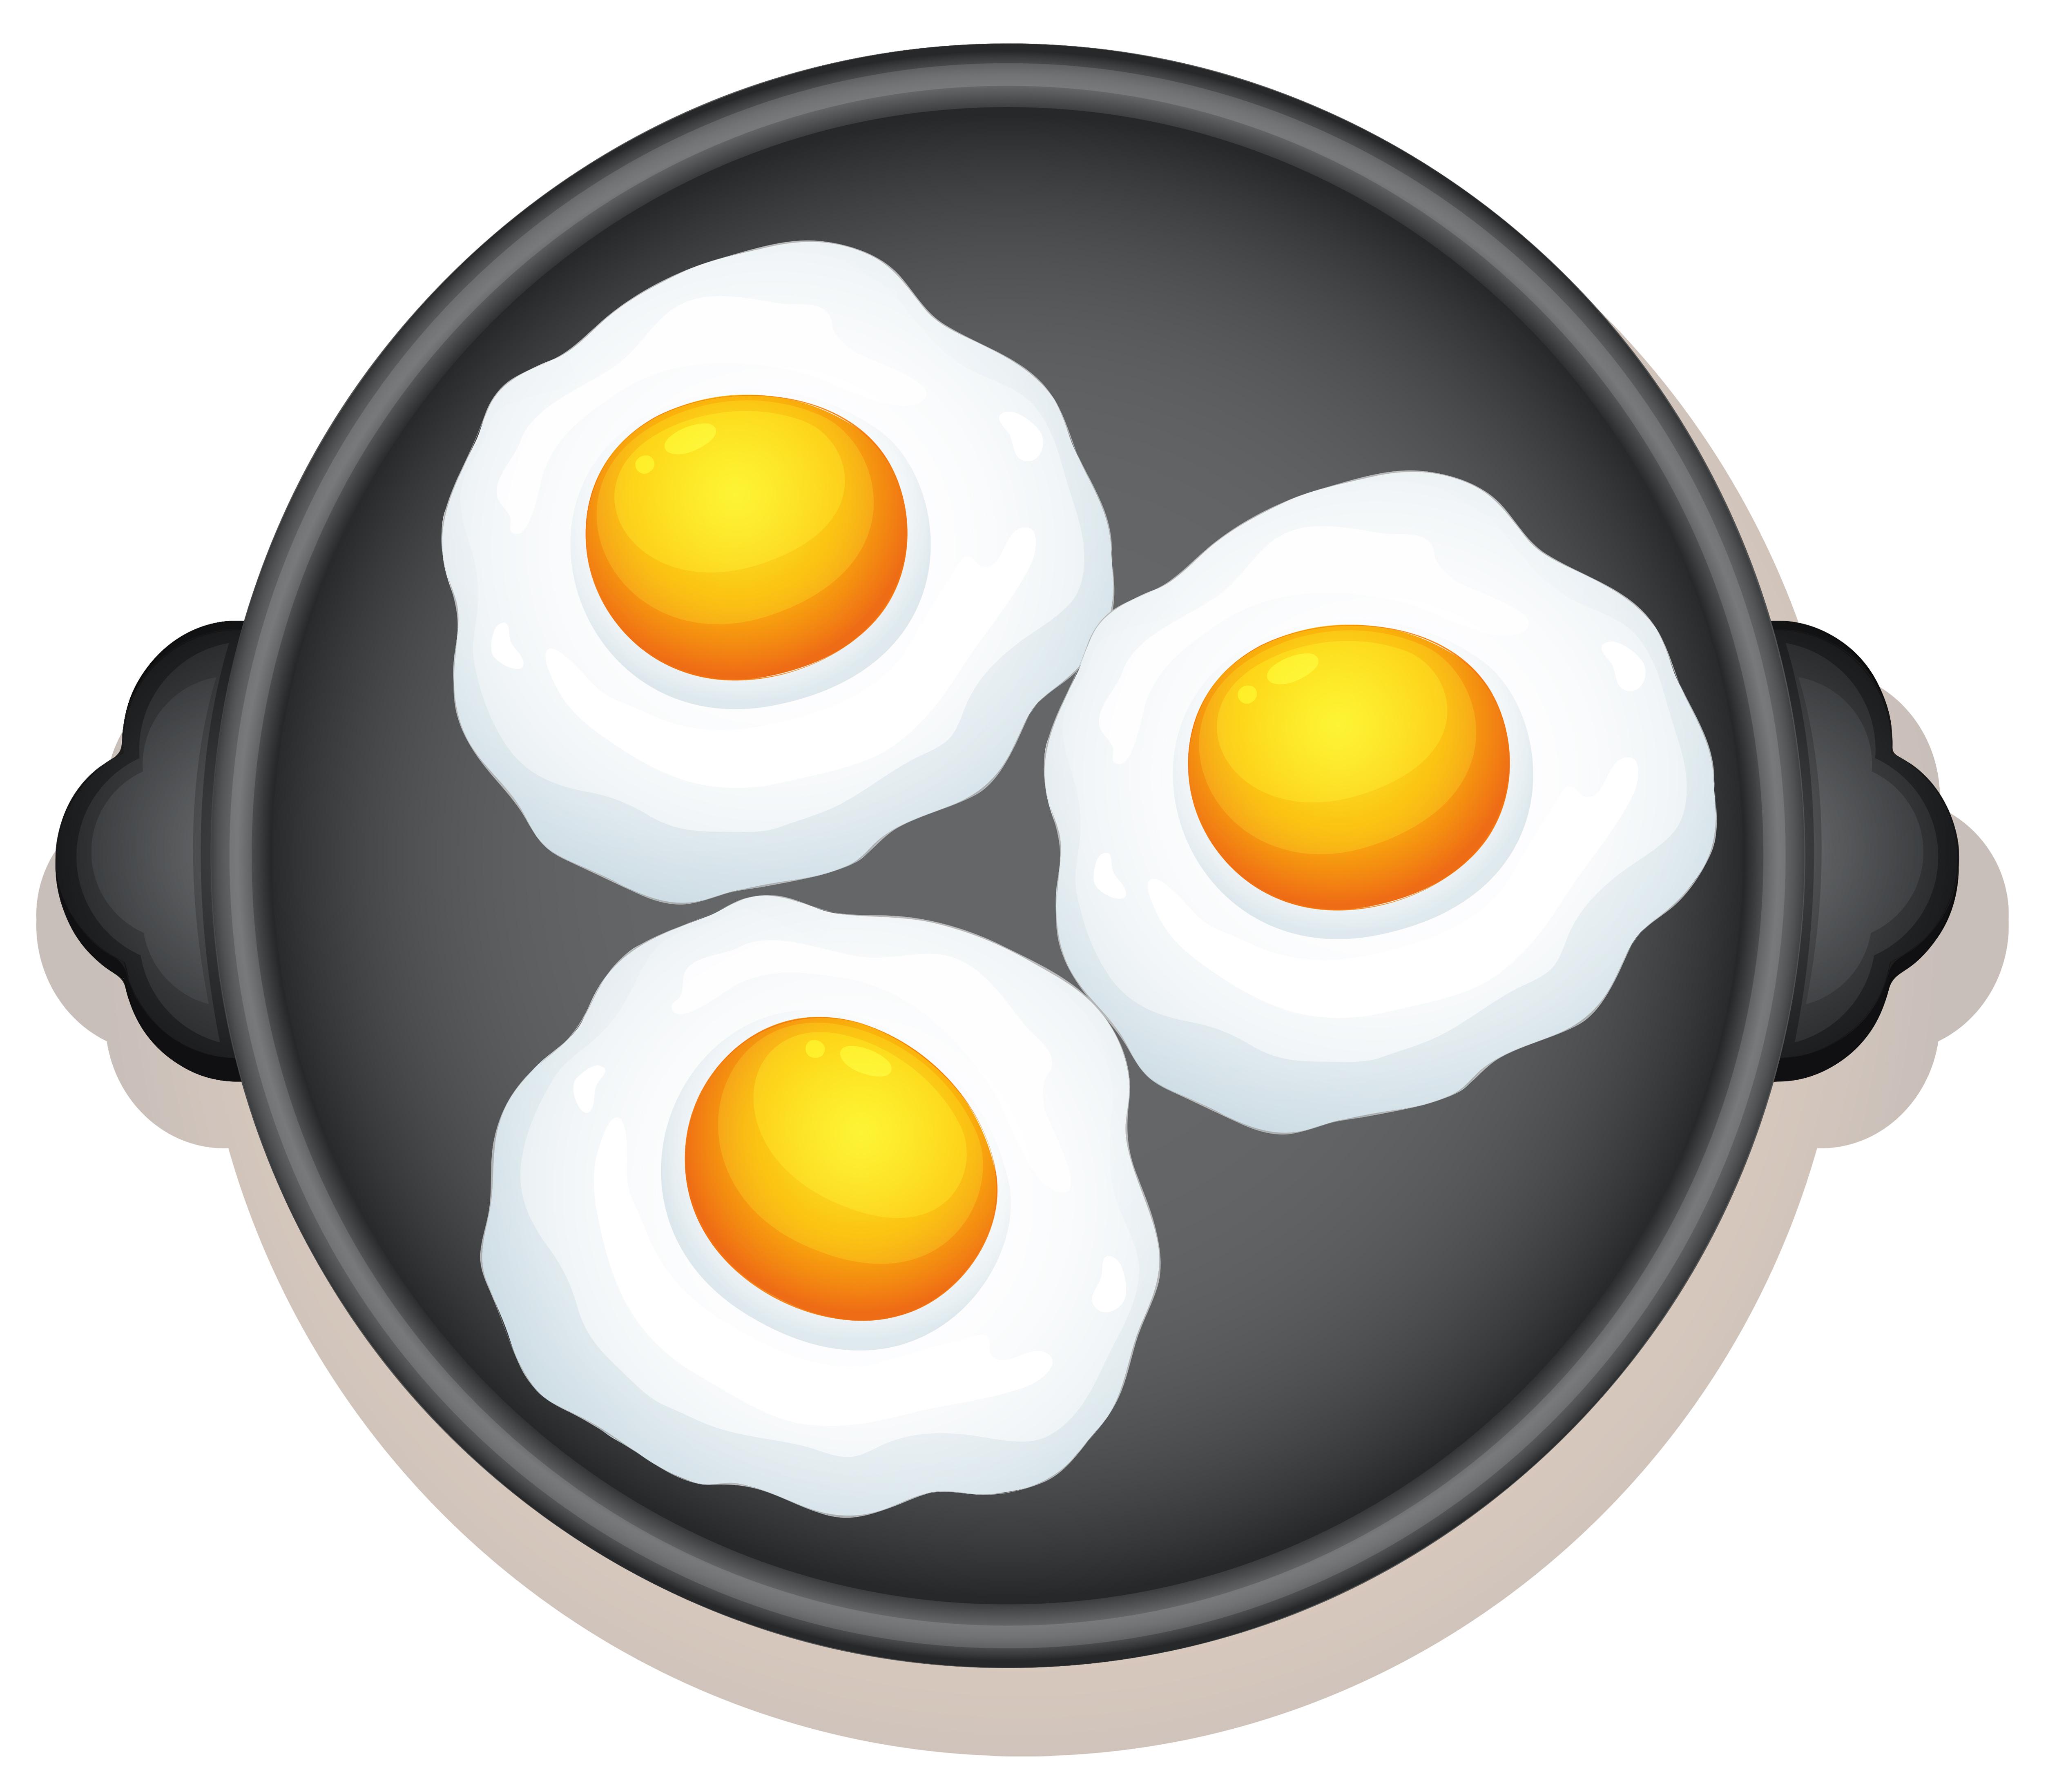 Sunny Side Up Egg Free Vector Art.